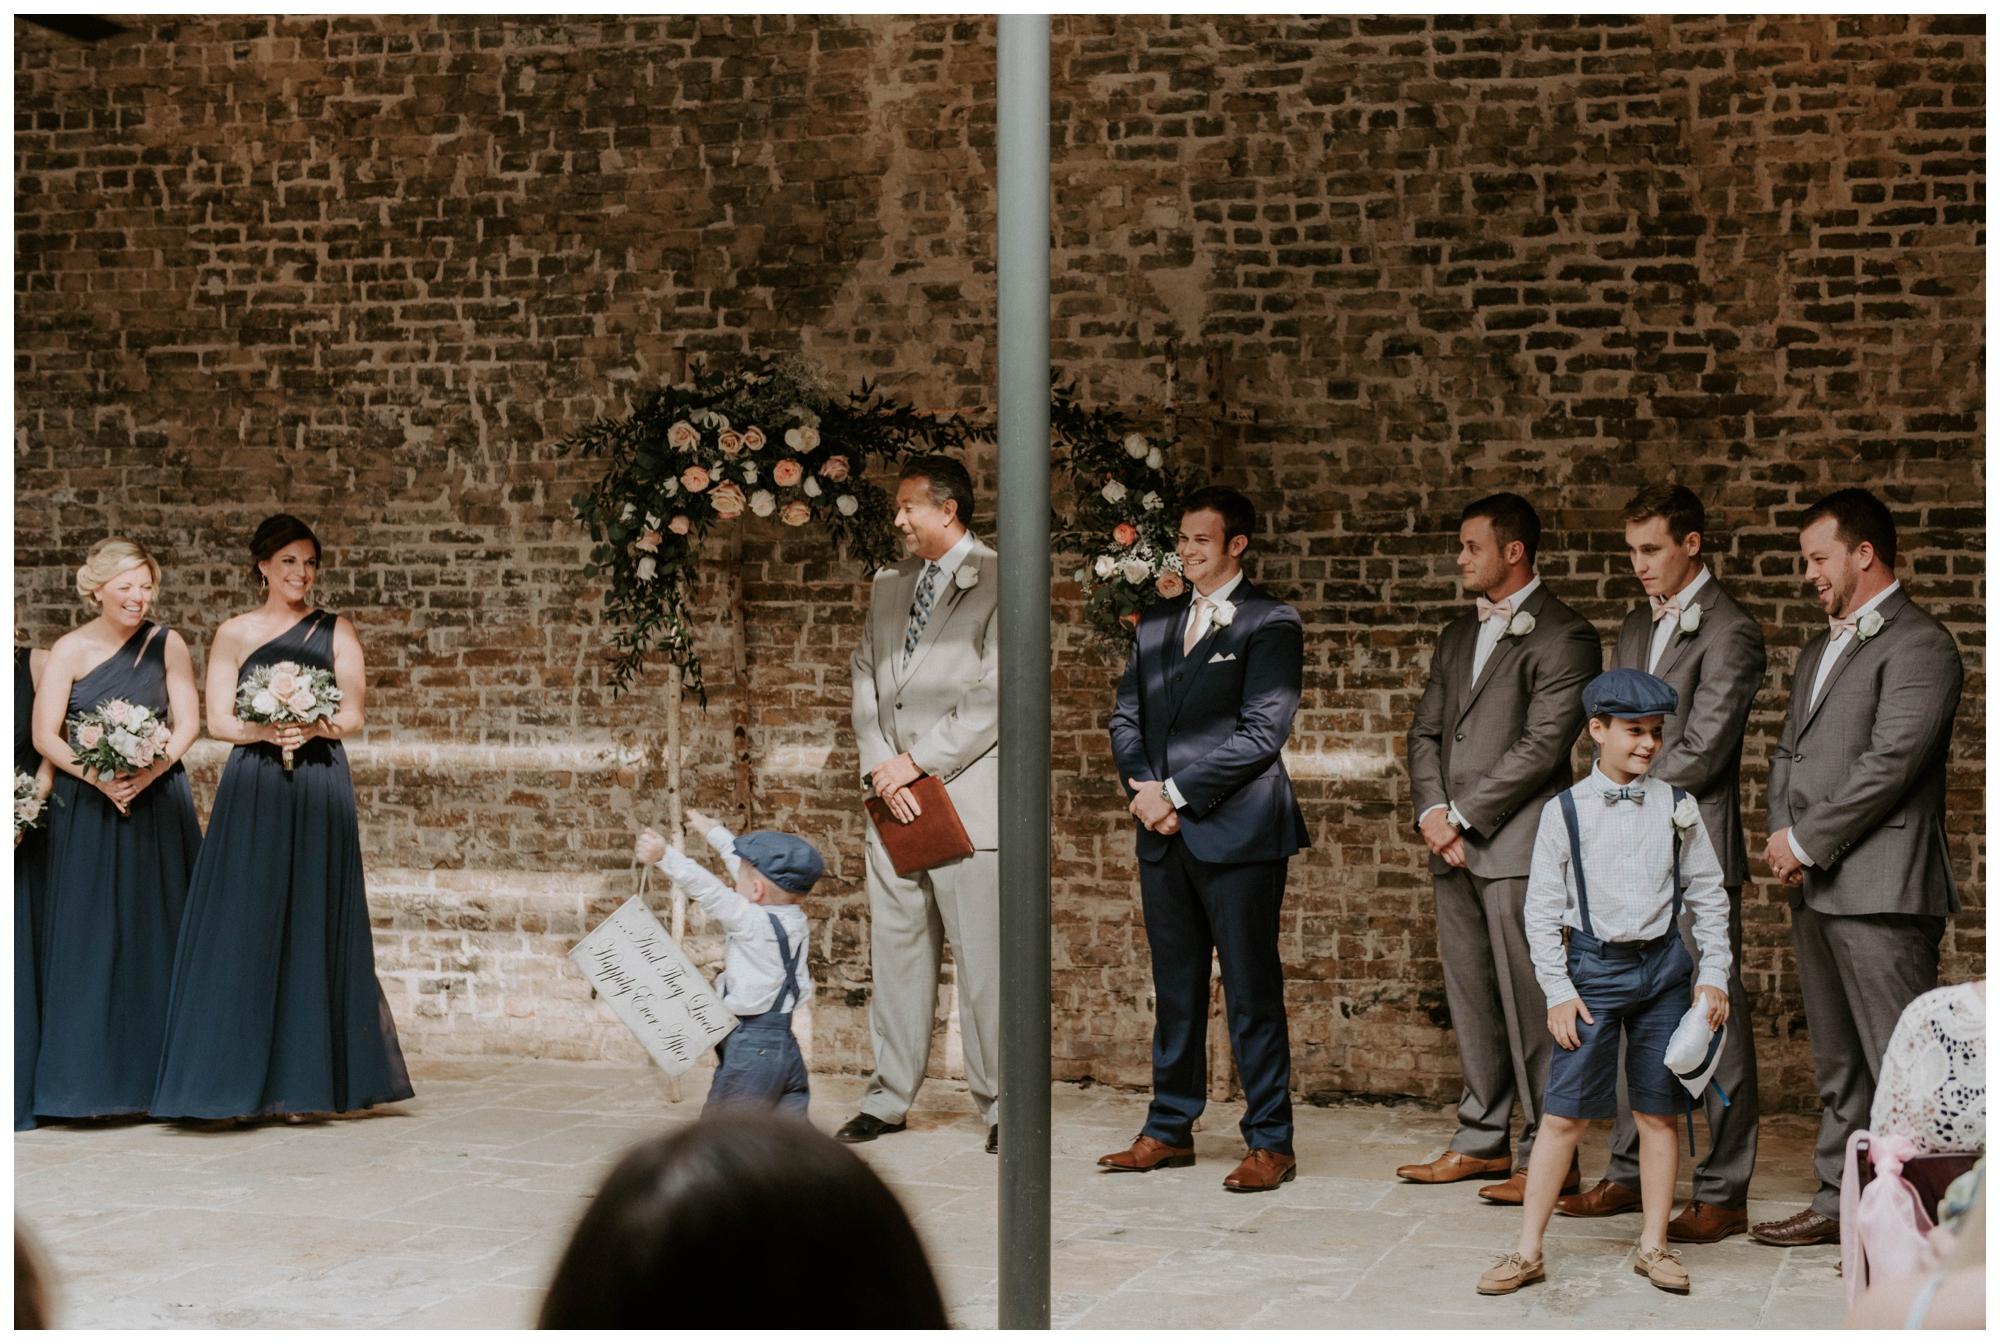 austin-texas-wedding-photography-1778-photographie_0048.jpg